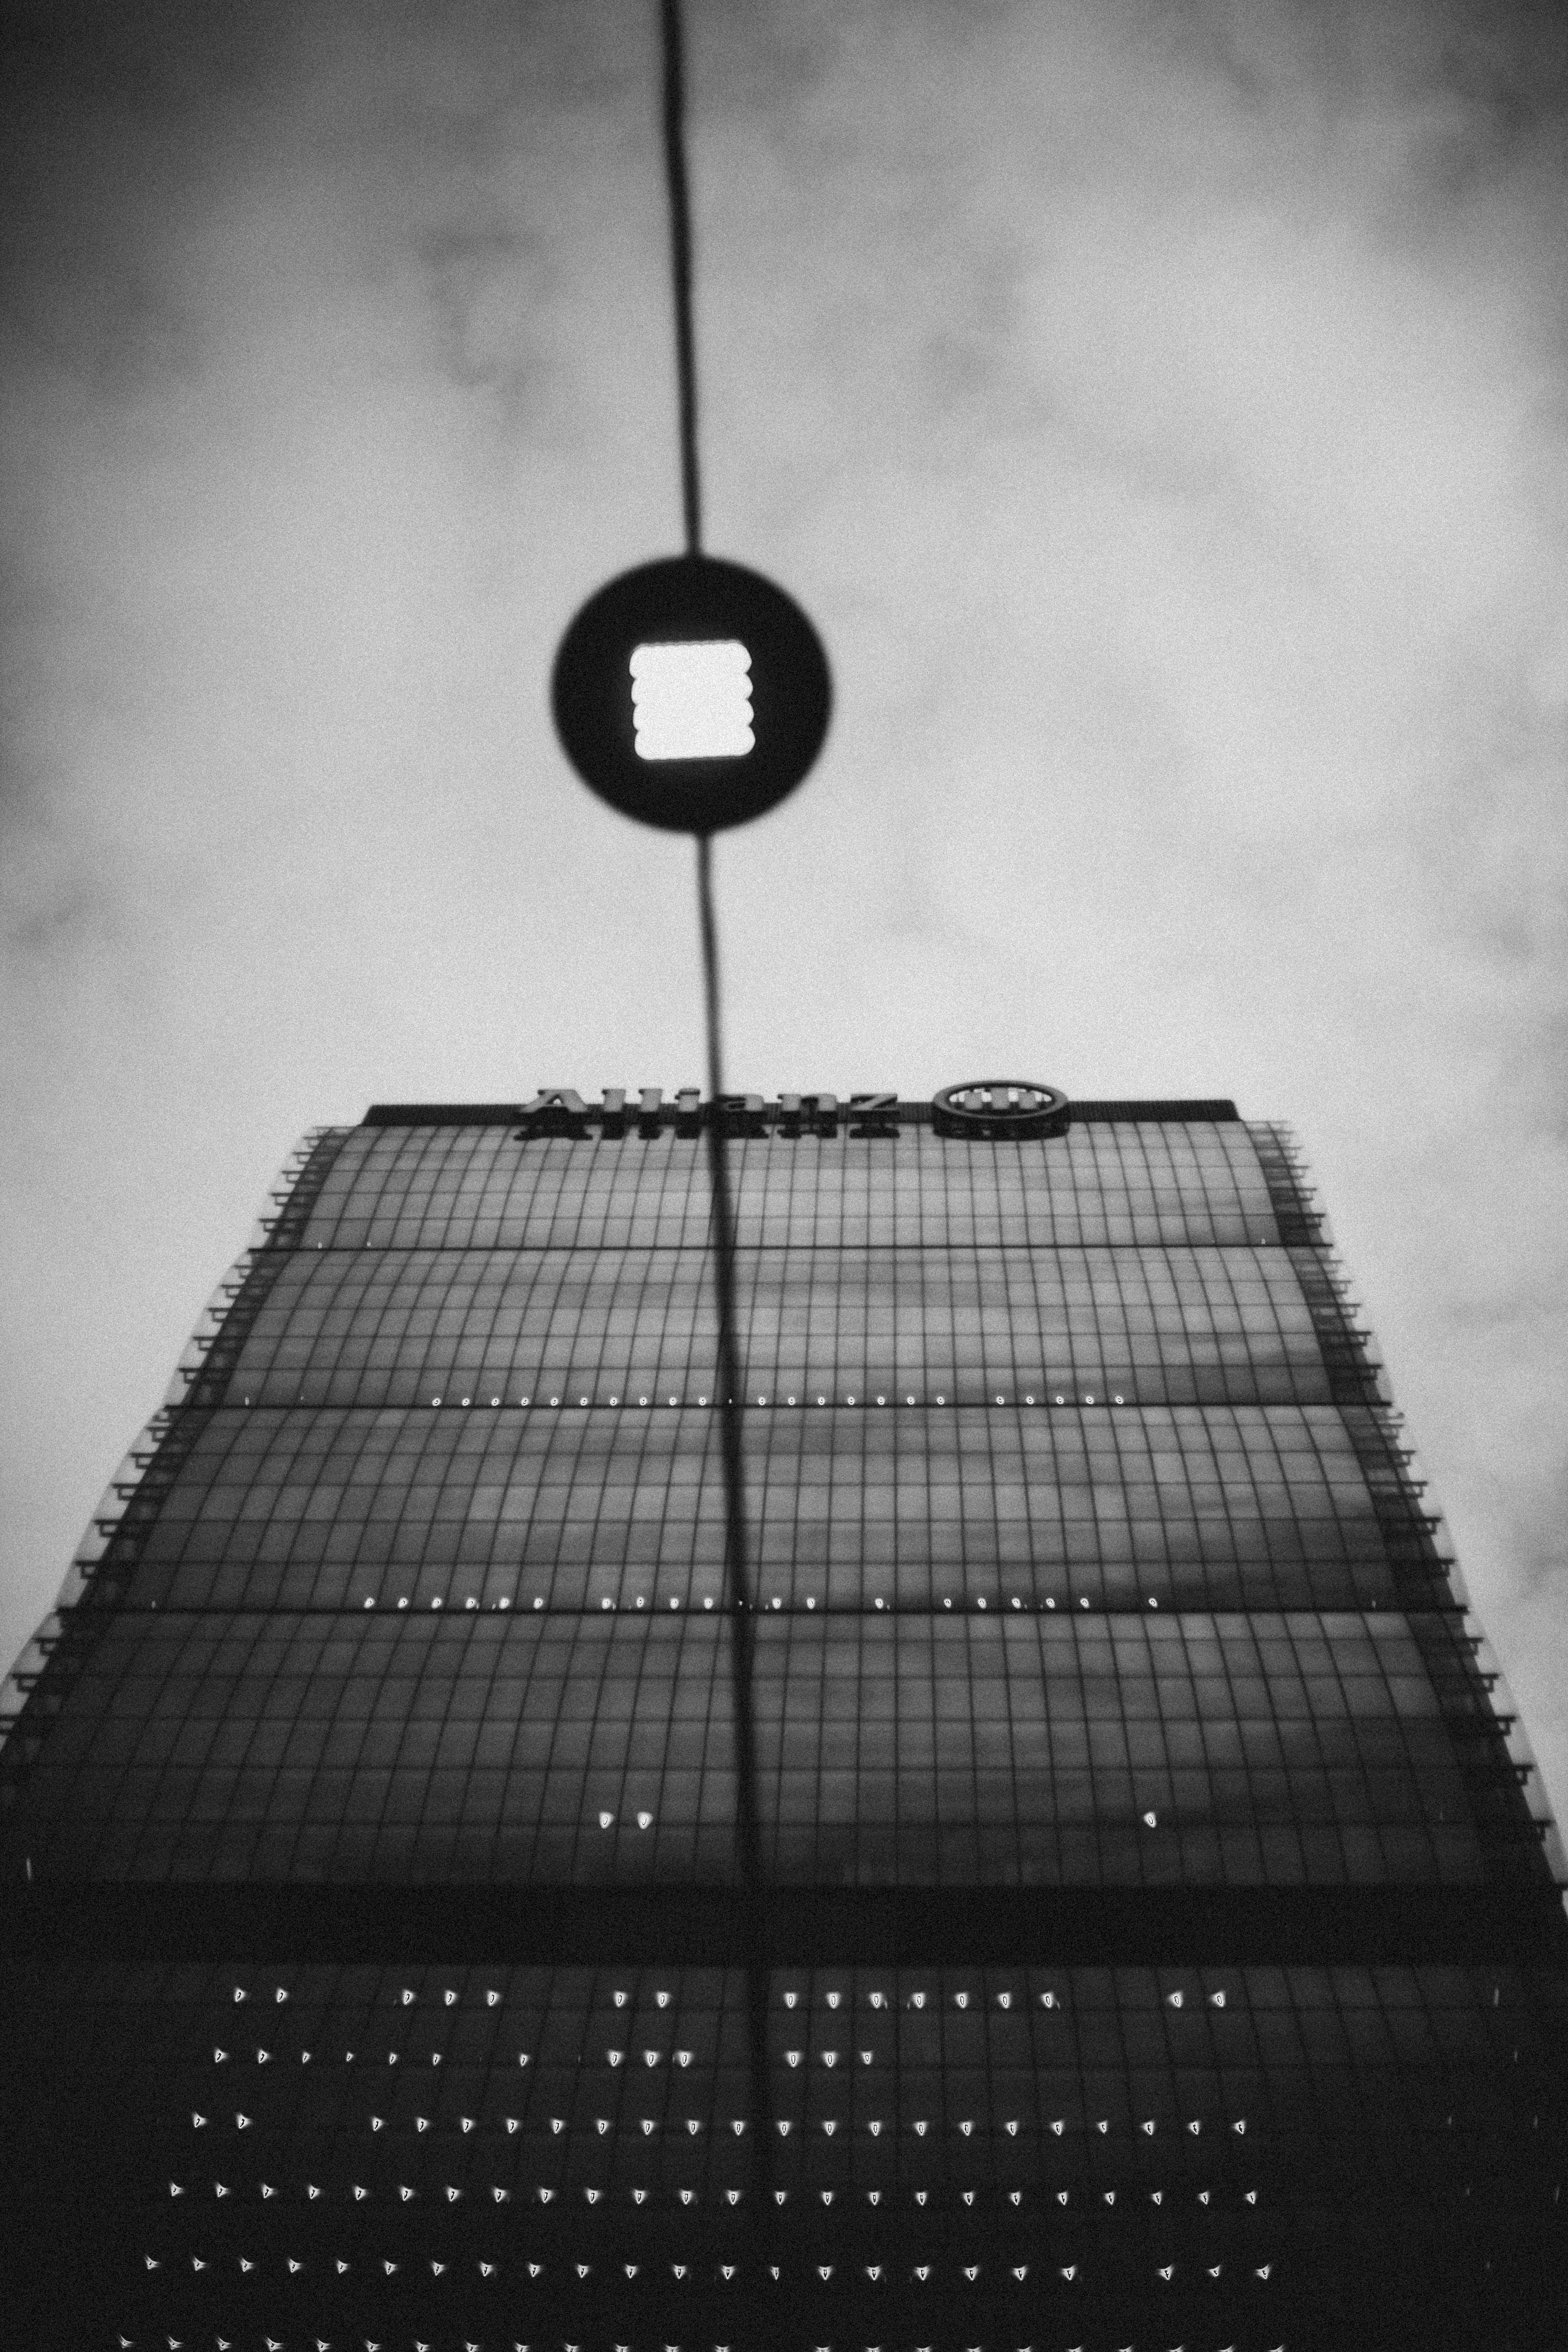 Free stock photo of architectural design, architecture. city, black and white, black and-white